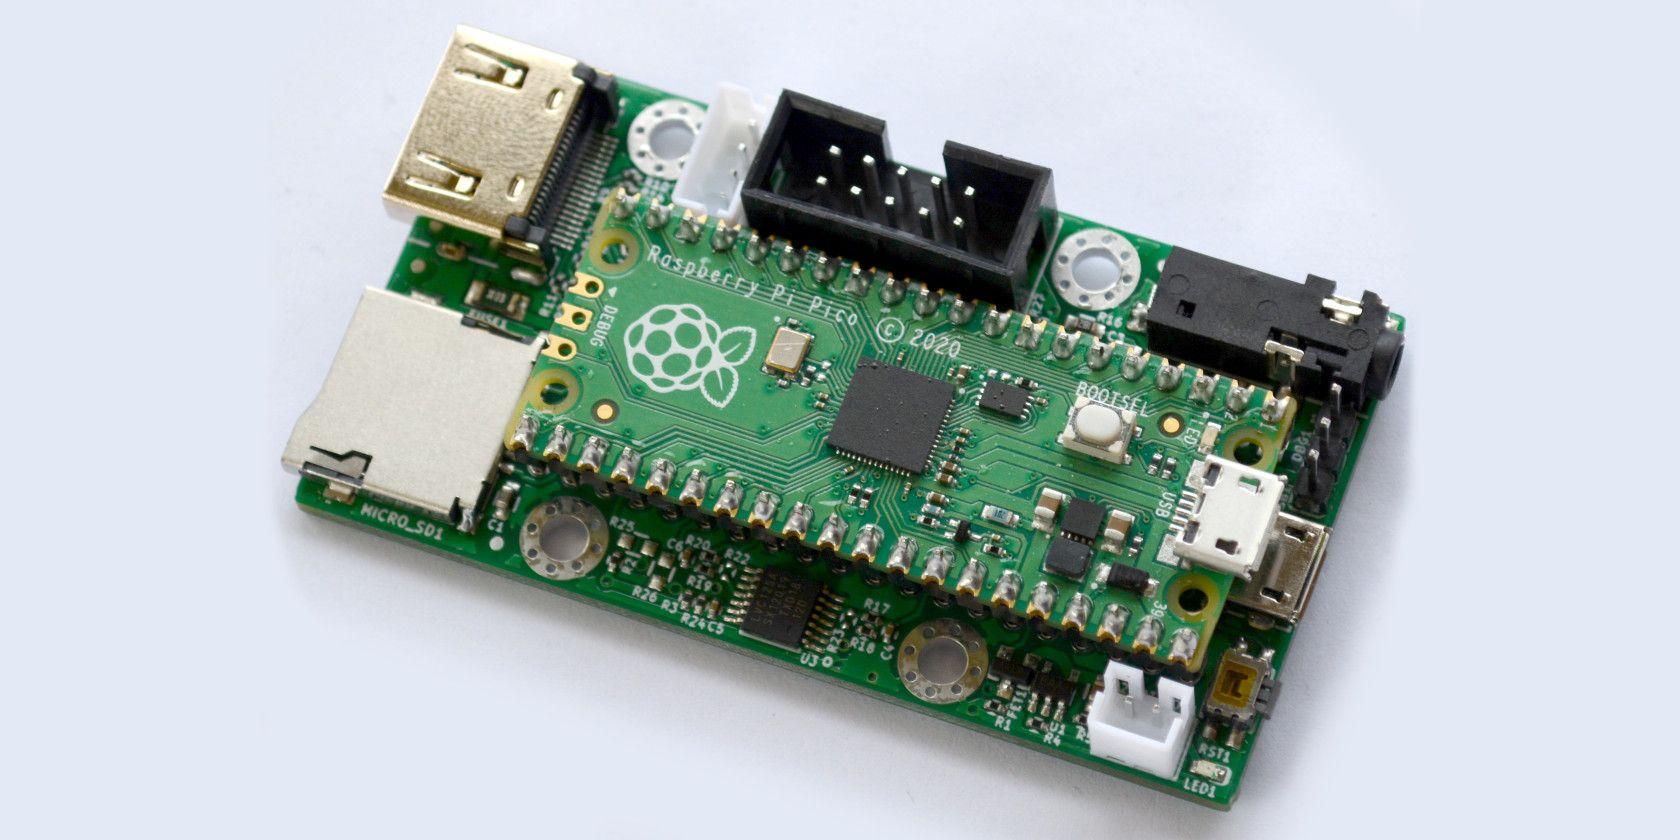 Olimex Just Turned the Raspberry Pi Pico Into a Mini-PC